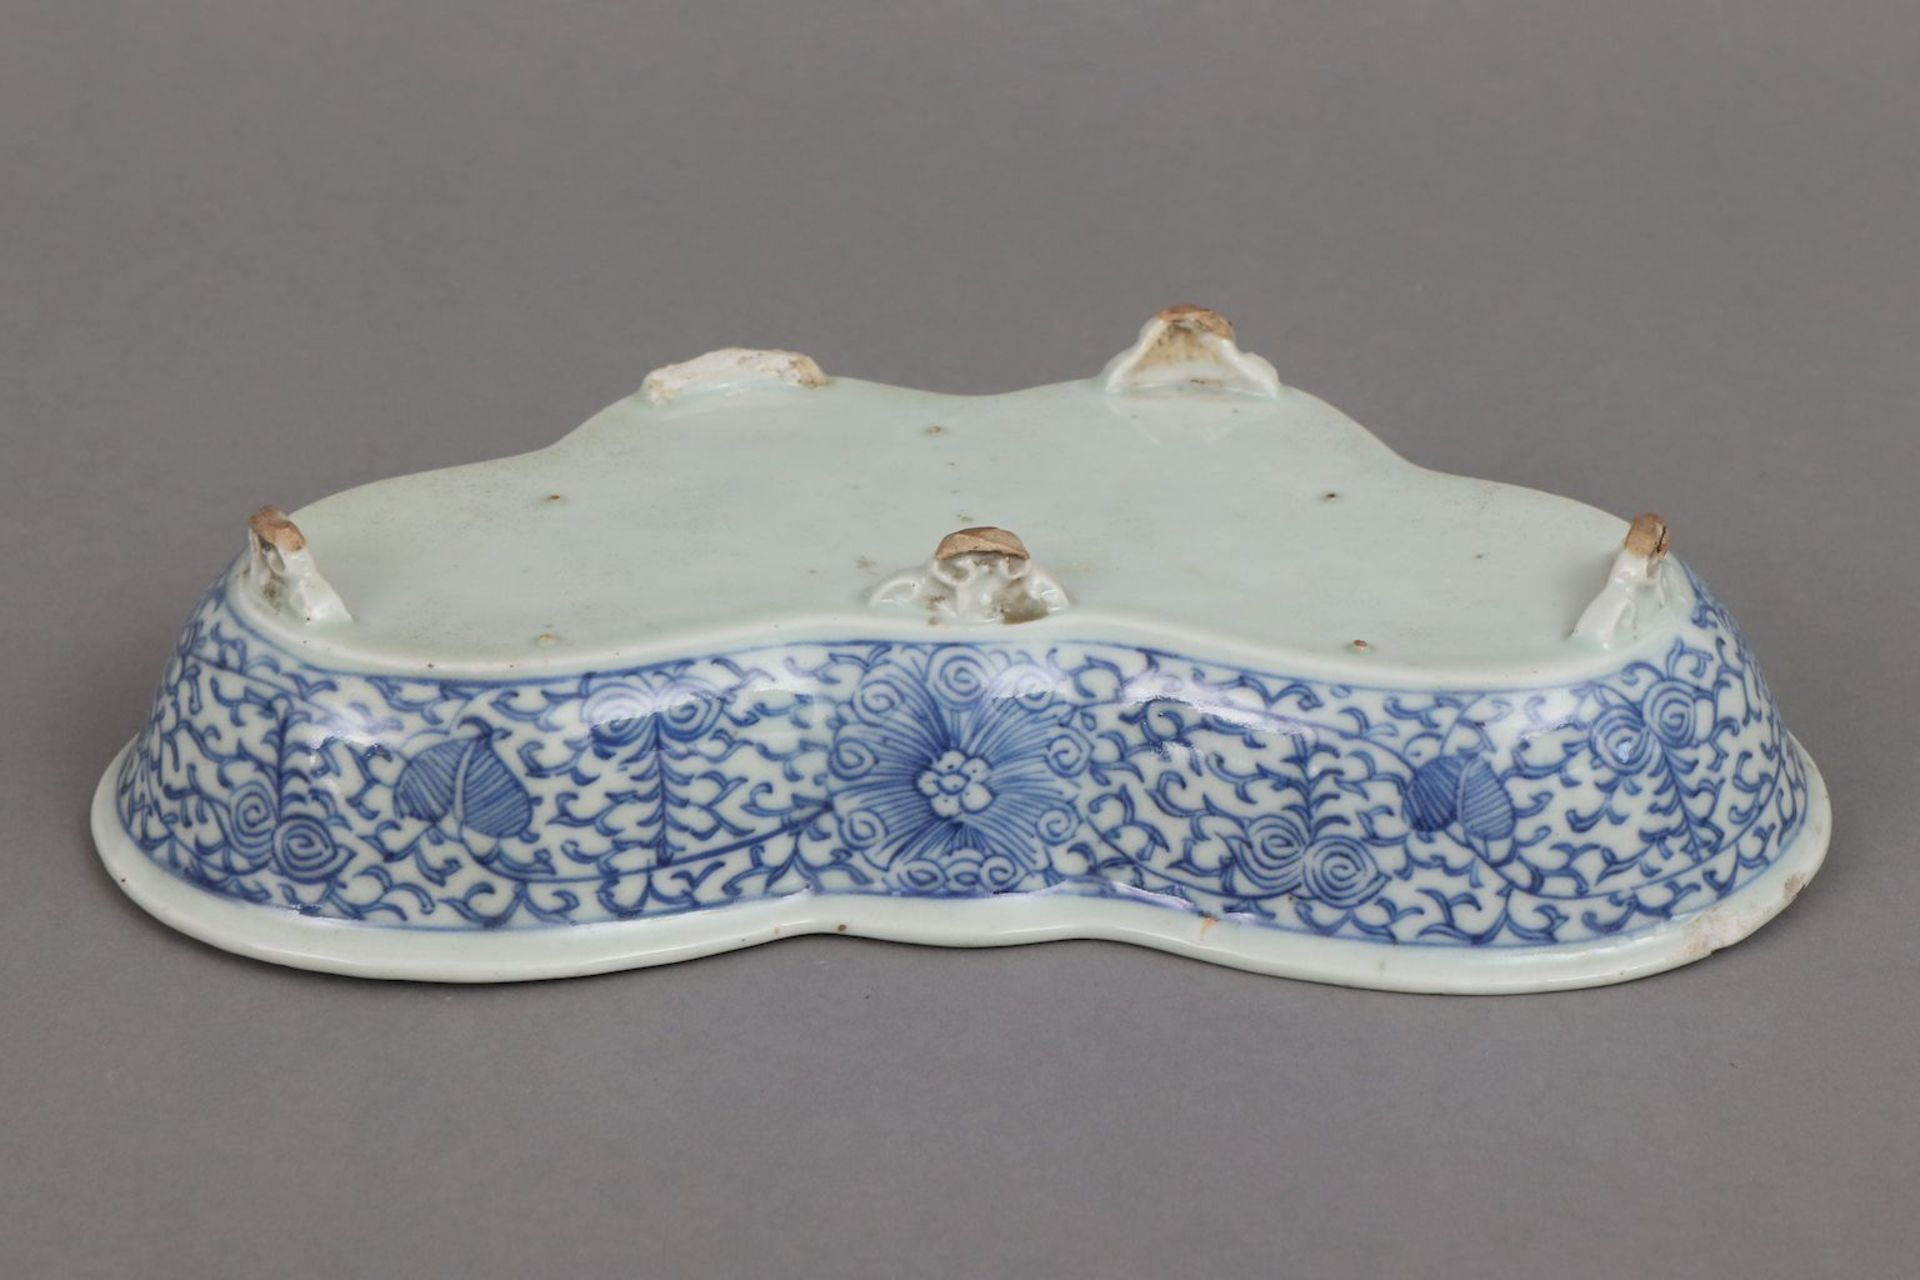 Chinesische Bonsai-Pflanzschale - Image 3 of 5